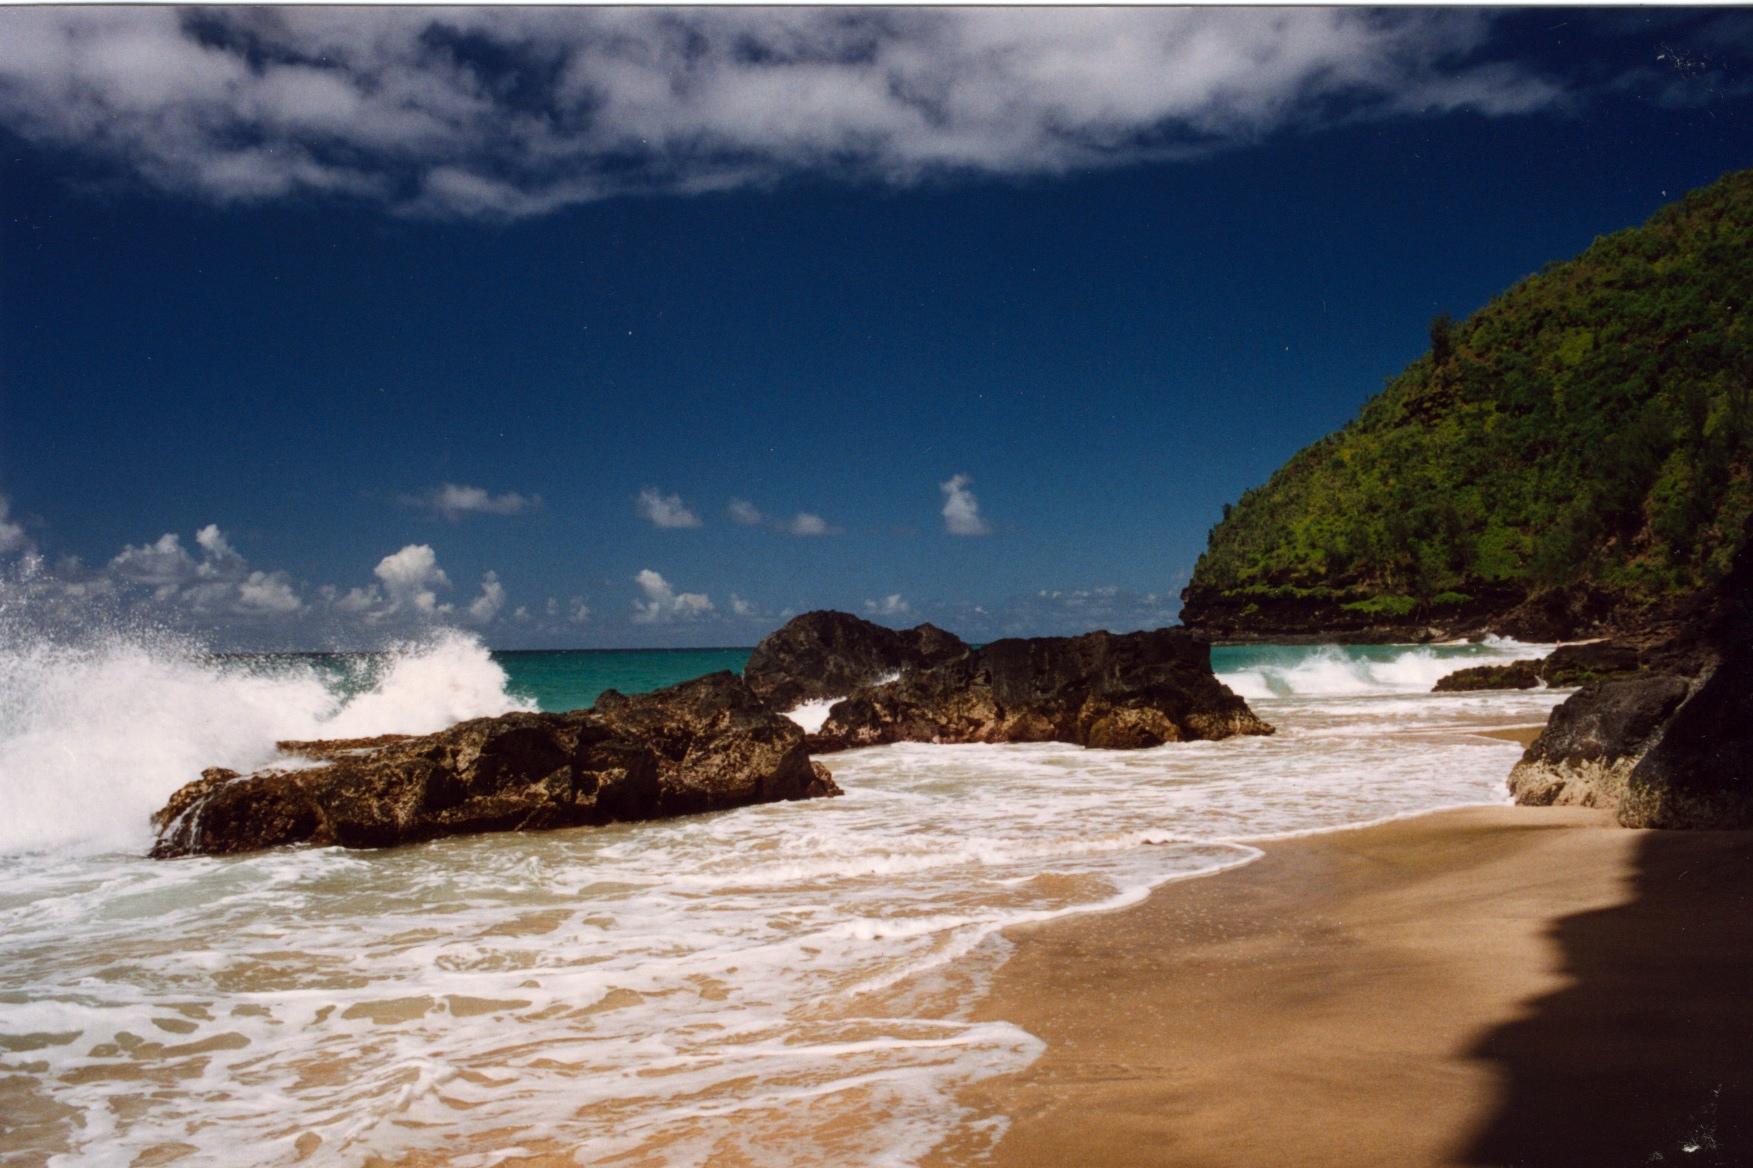 hanakapiai_beach_na_pali_coast_kauai_hawaii